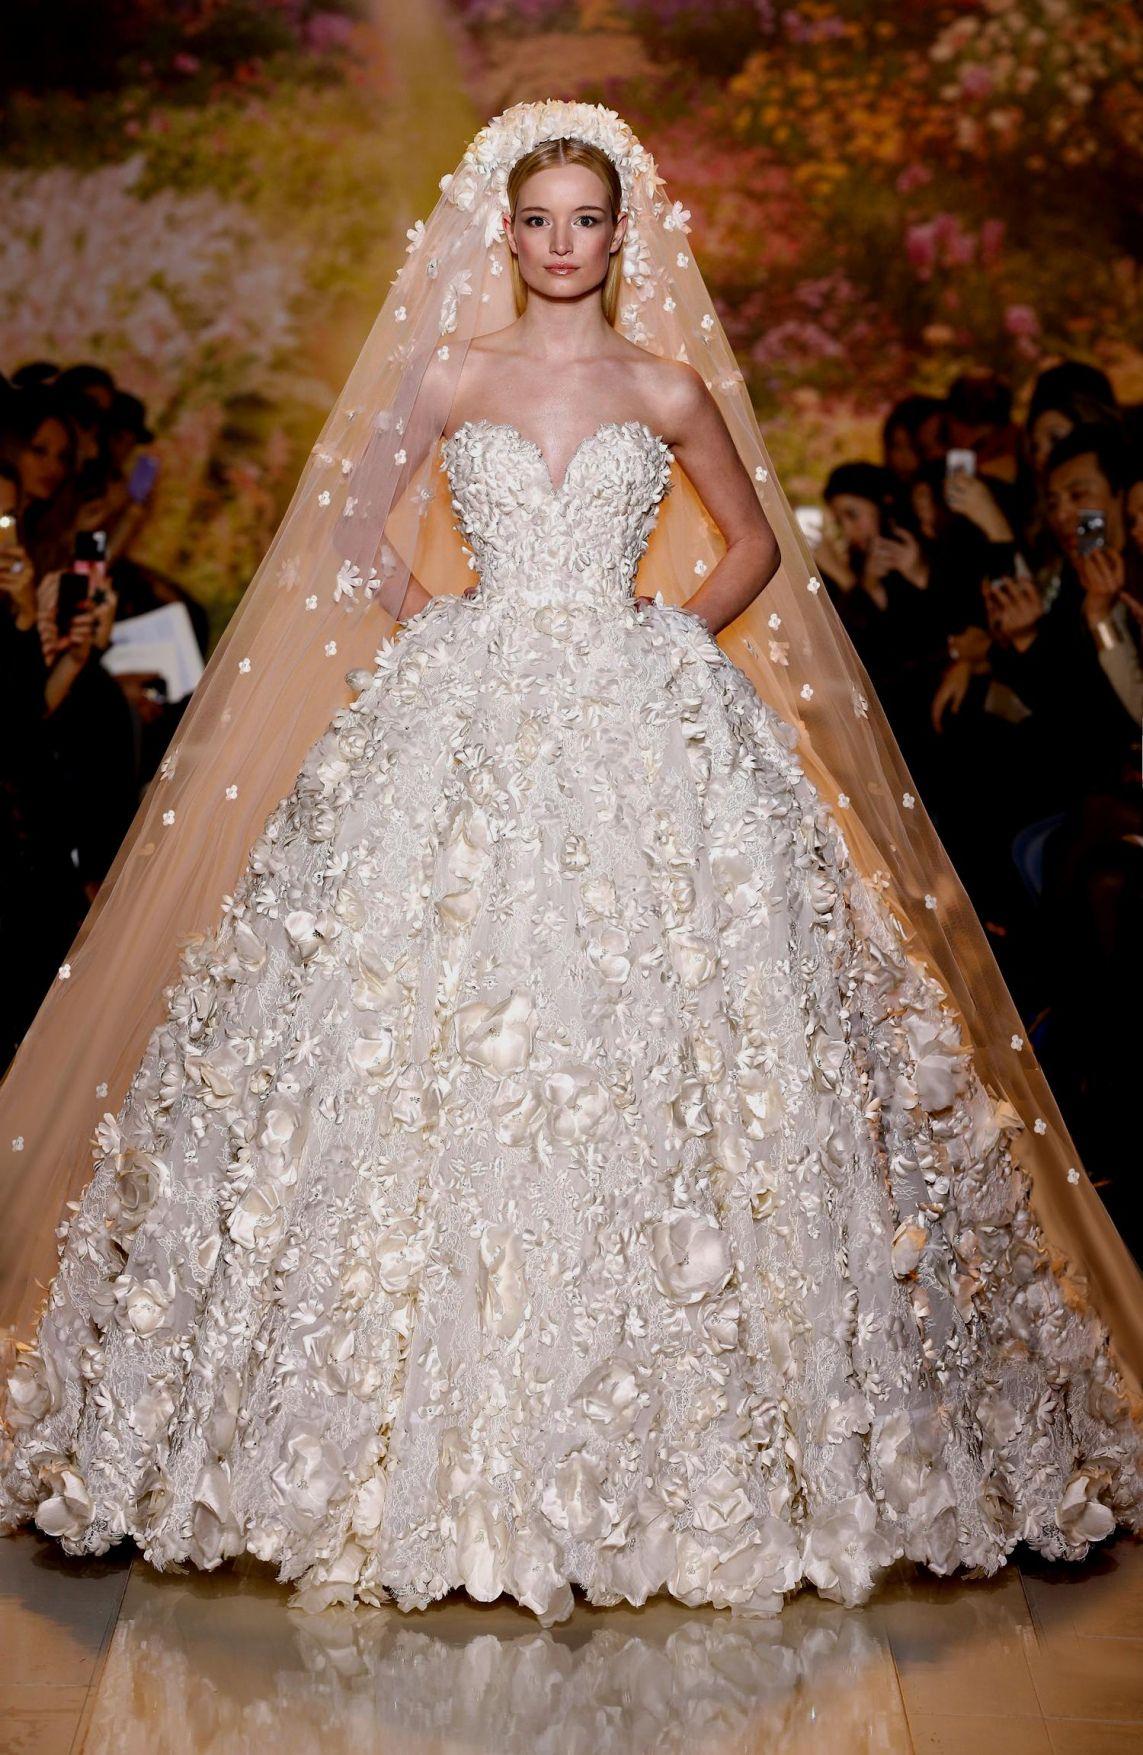 55+ top 10 Wedding Dress Designers - Wedding Dresses for Guests ...